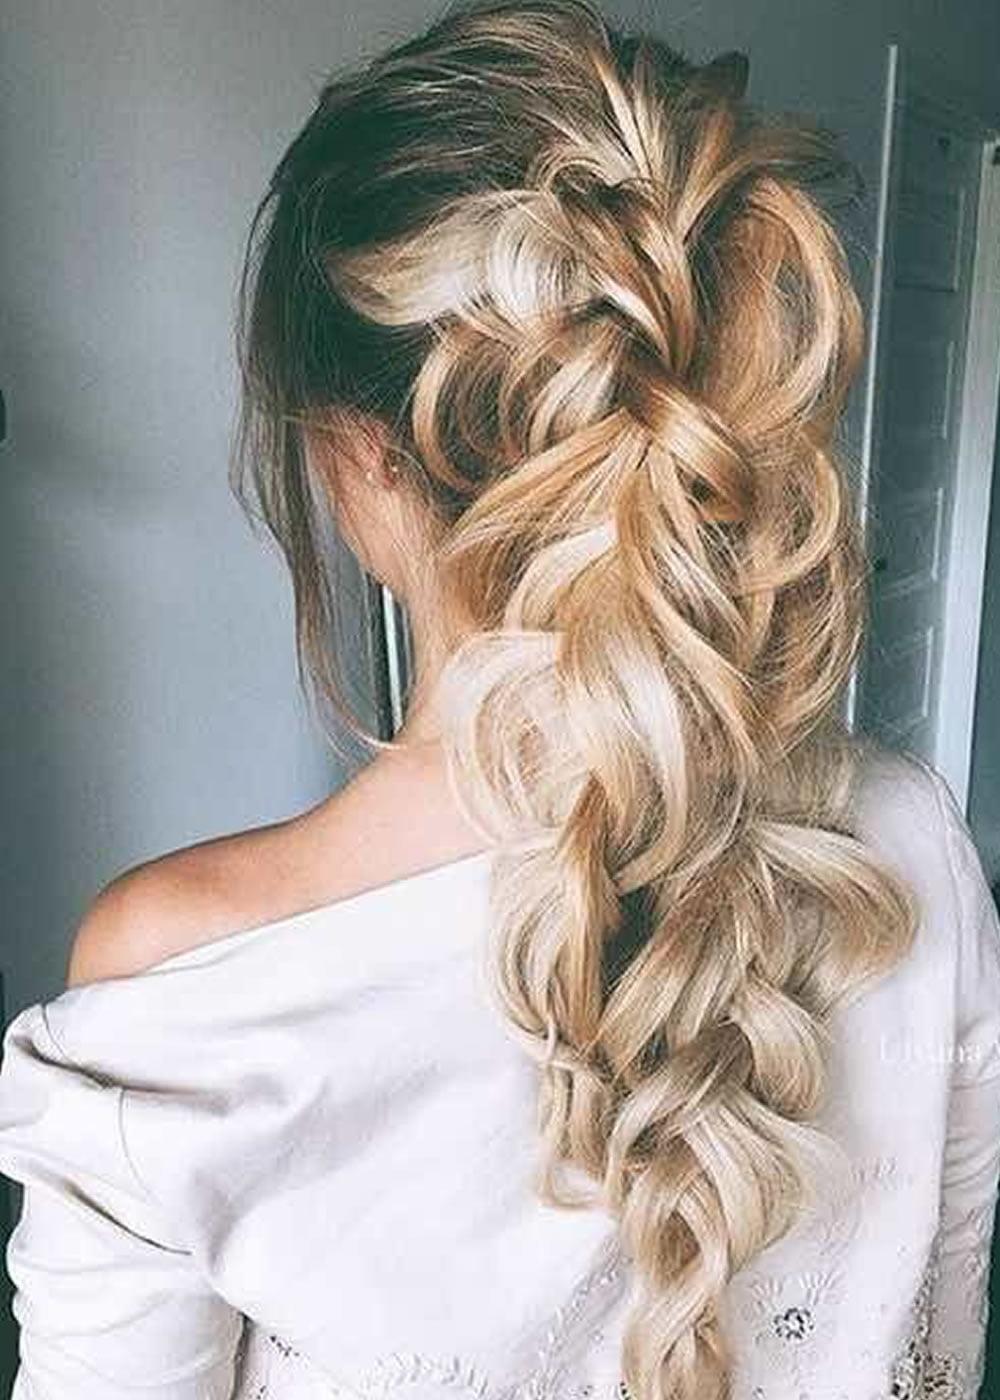 25 Very Stylish Soft Braided Hairstyles ideas 2018-2019 ... - photo #12